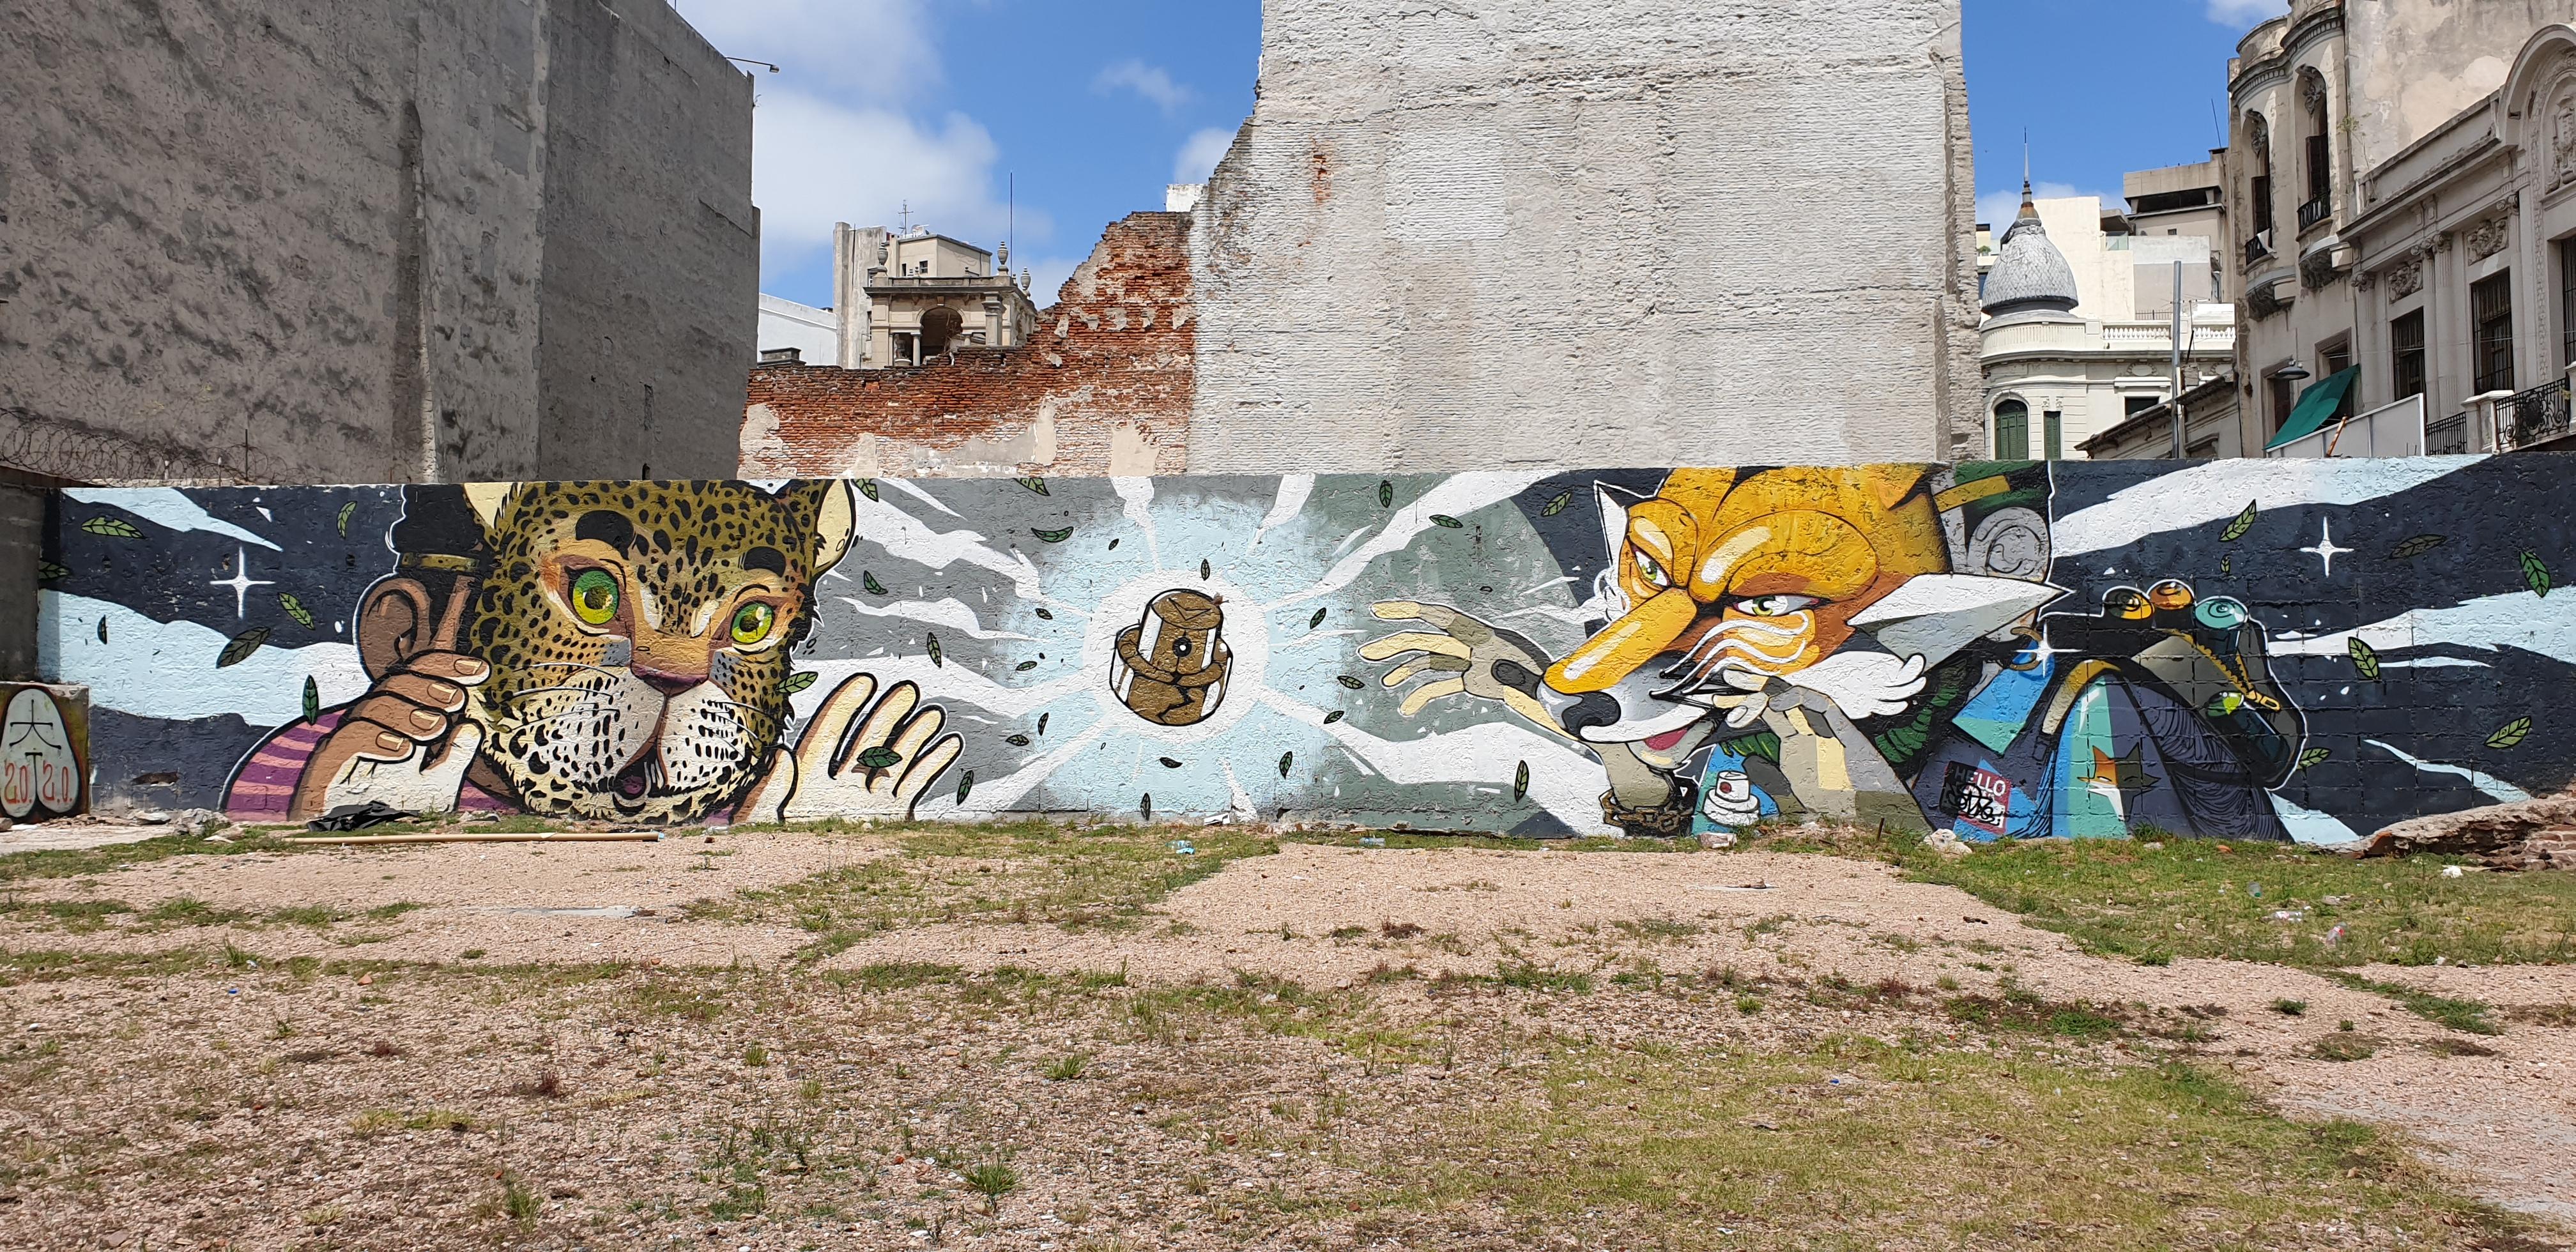 Mur réalisé par CondE COF et eXRandÖmyKo - Montevideo- Uruguay 2020 - ©nofakeinmynews.com